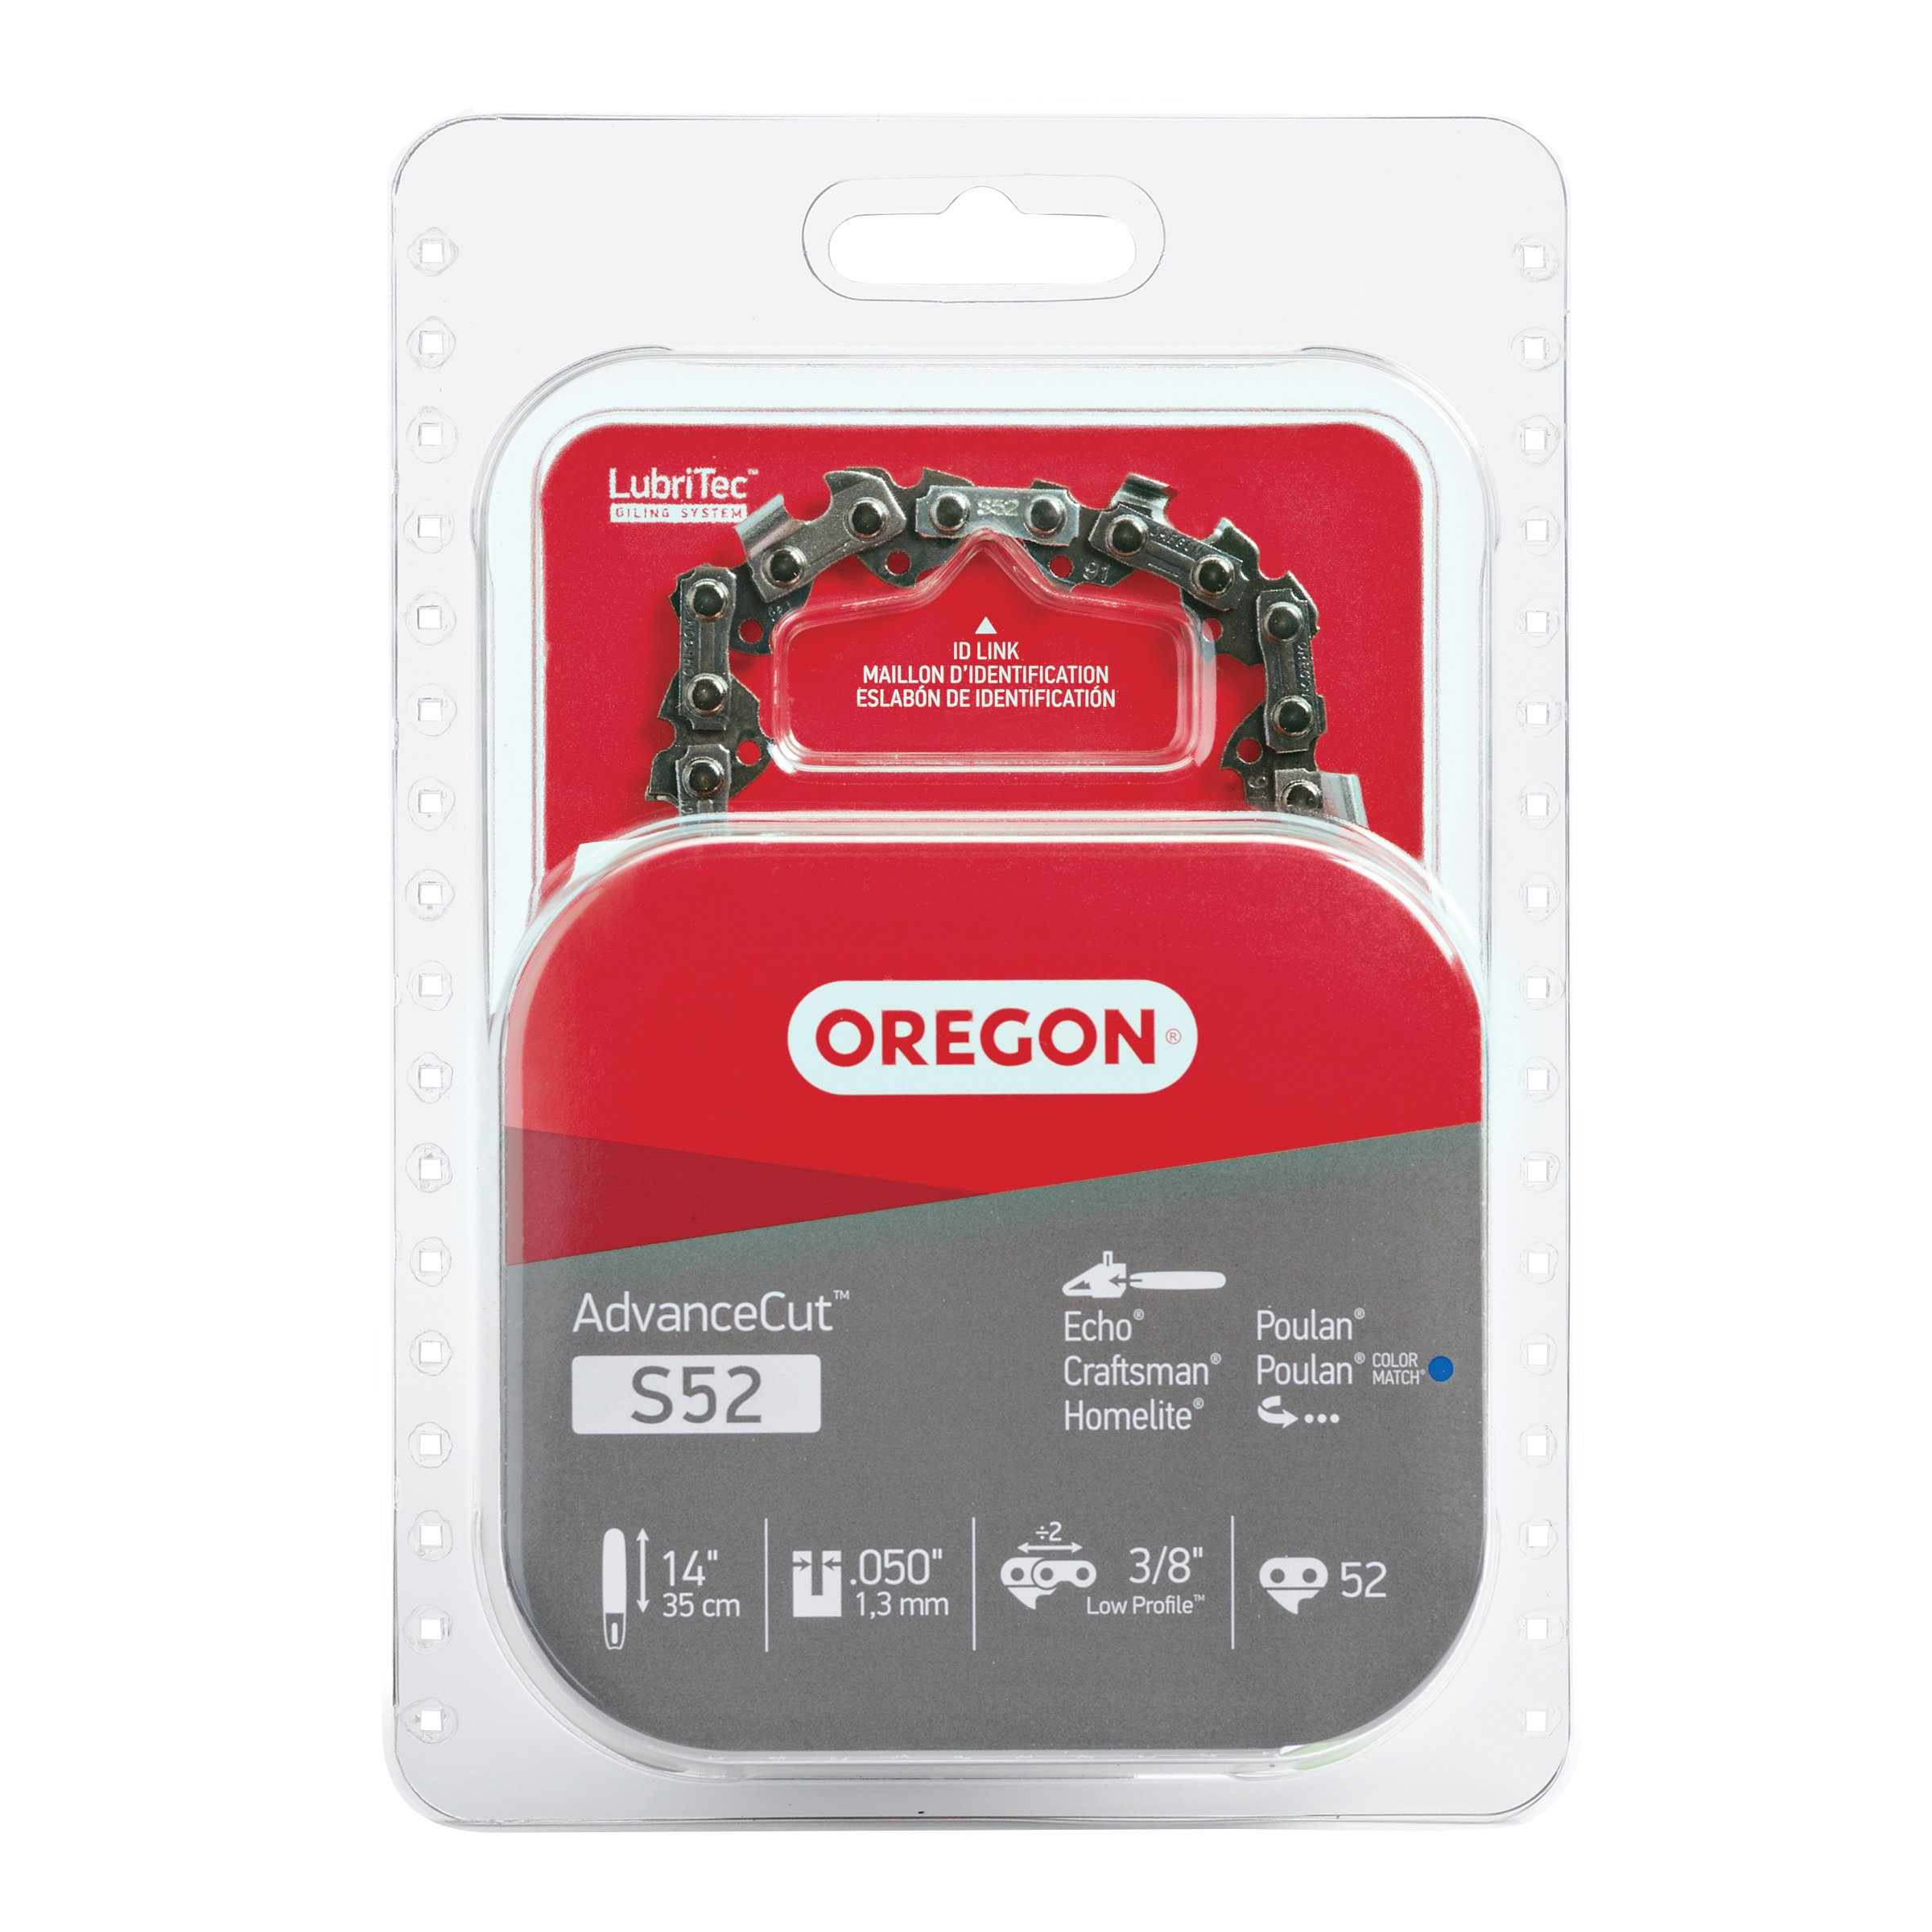 Oregon S52 AdvanceCut 14-Inch Chainsaw Chain Fits Craftsman, Echo, Homelite, Poulan